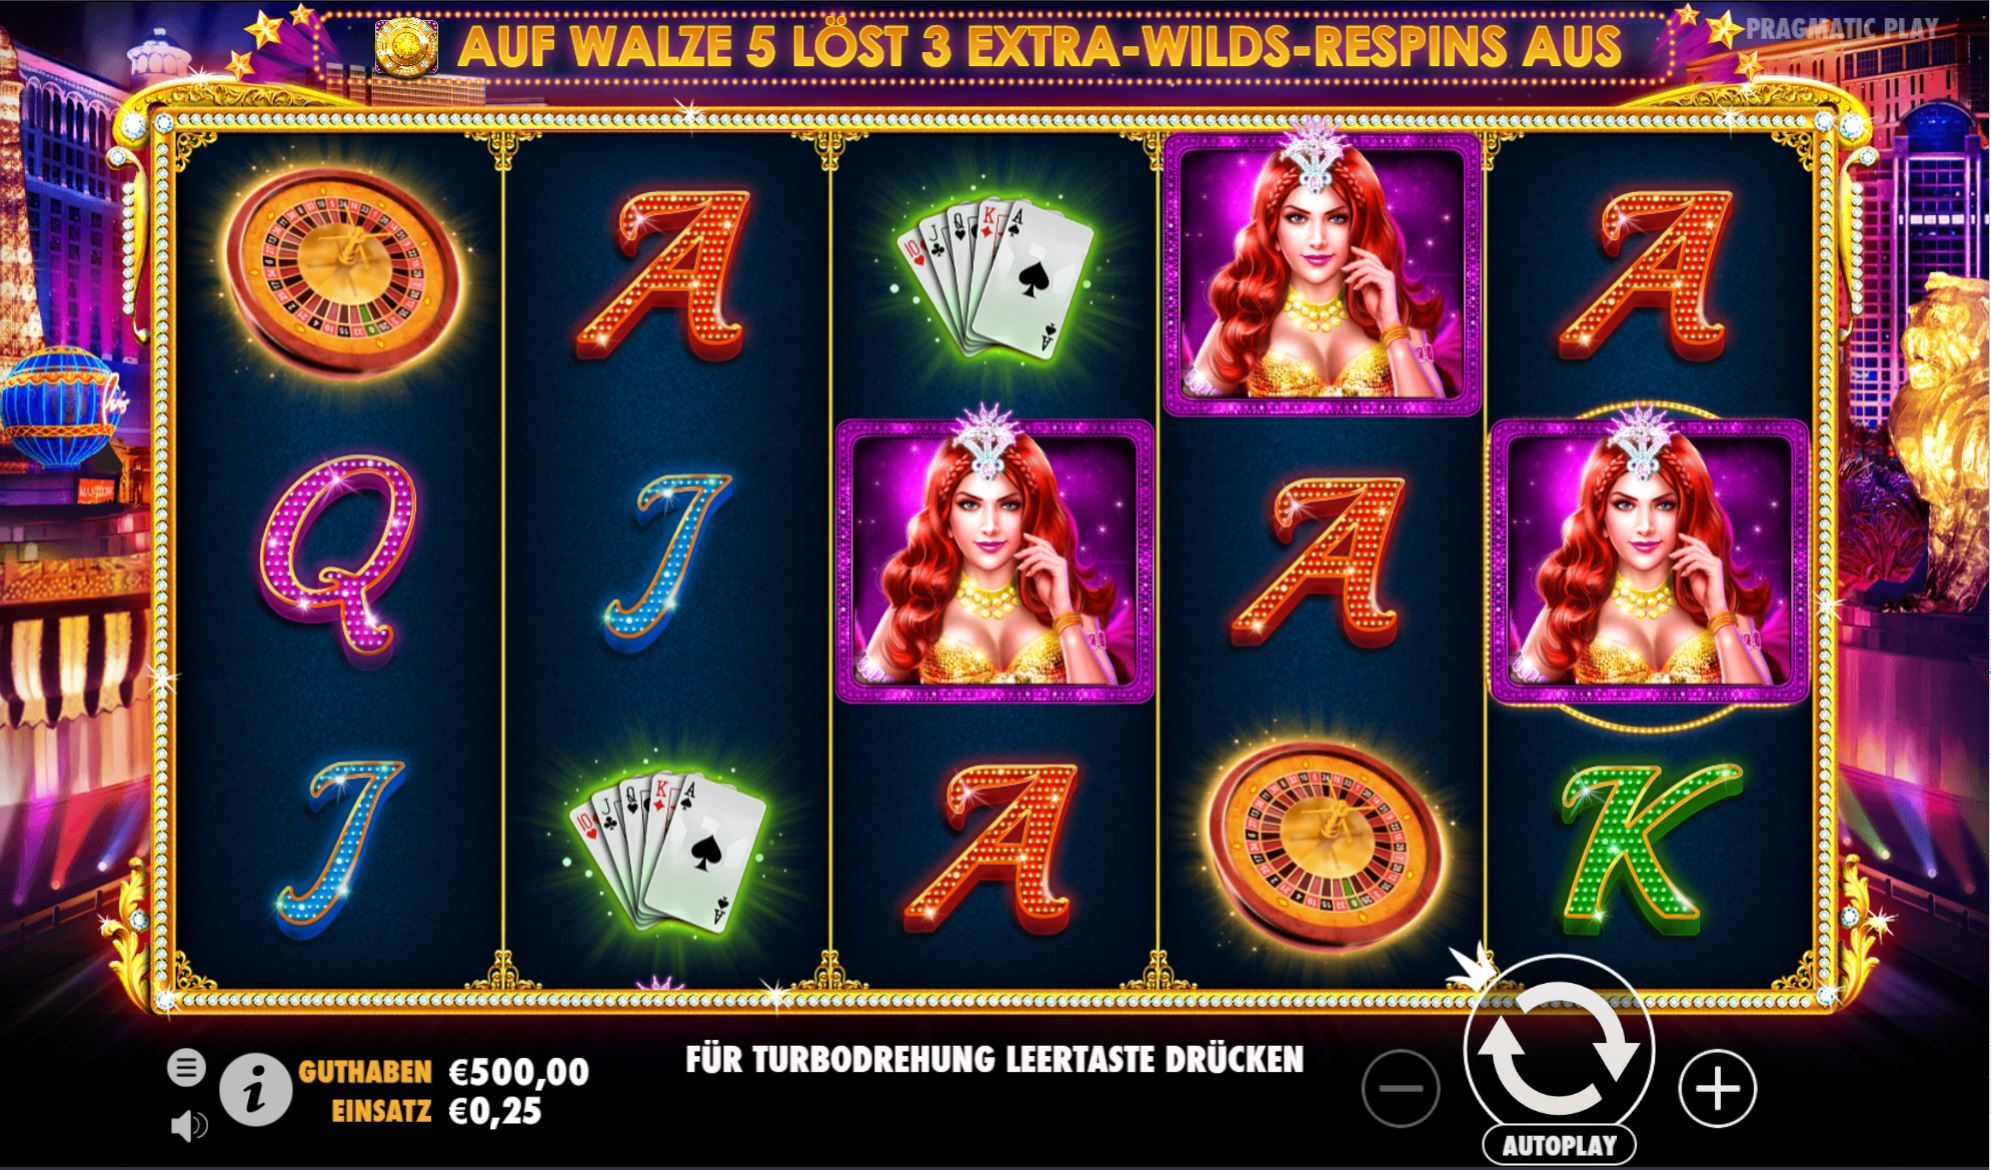 Spielgeld Casino Online